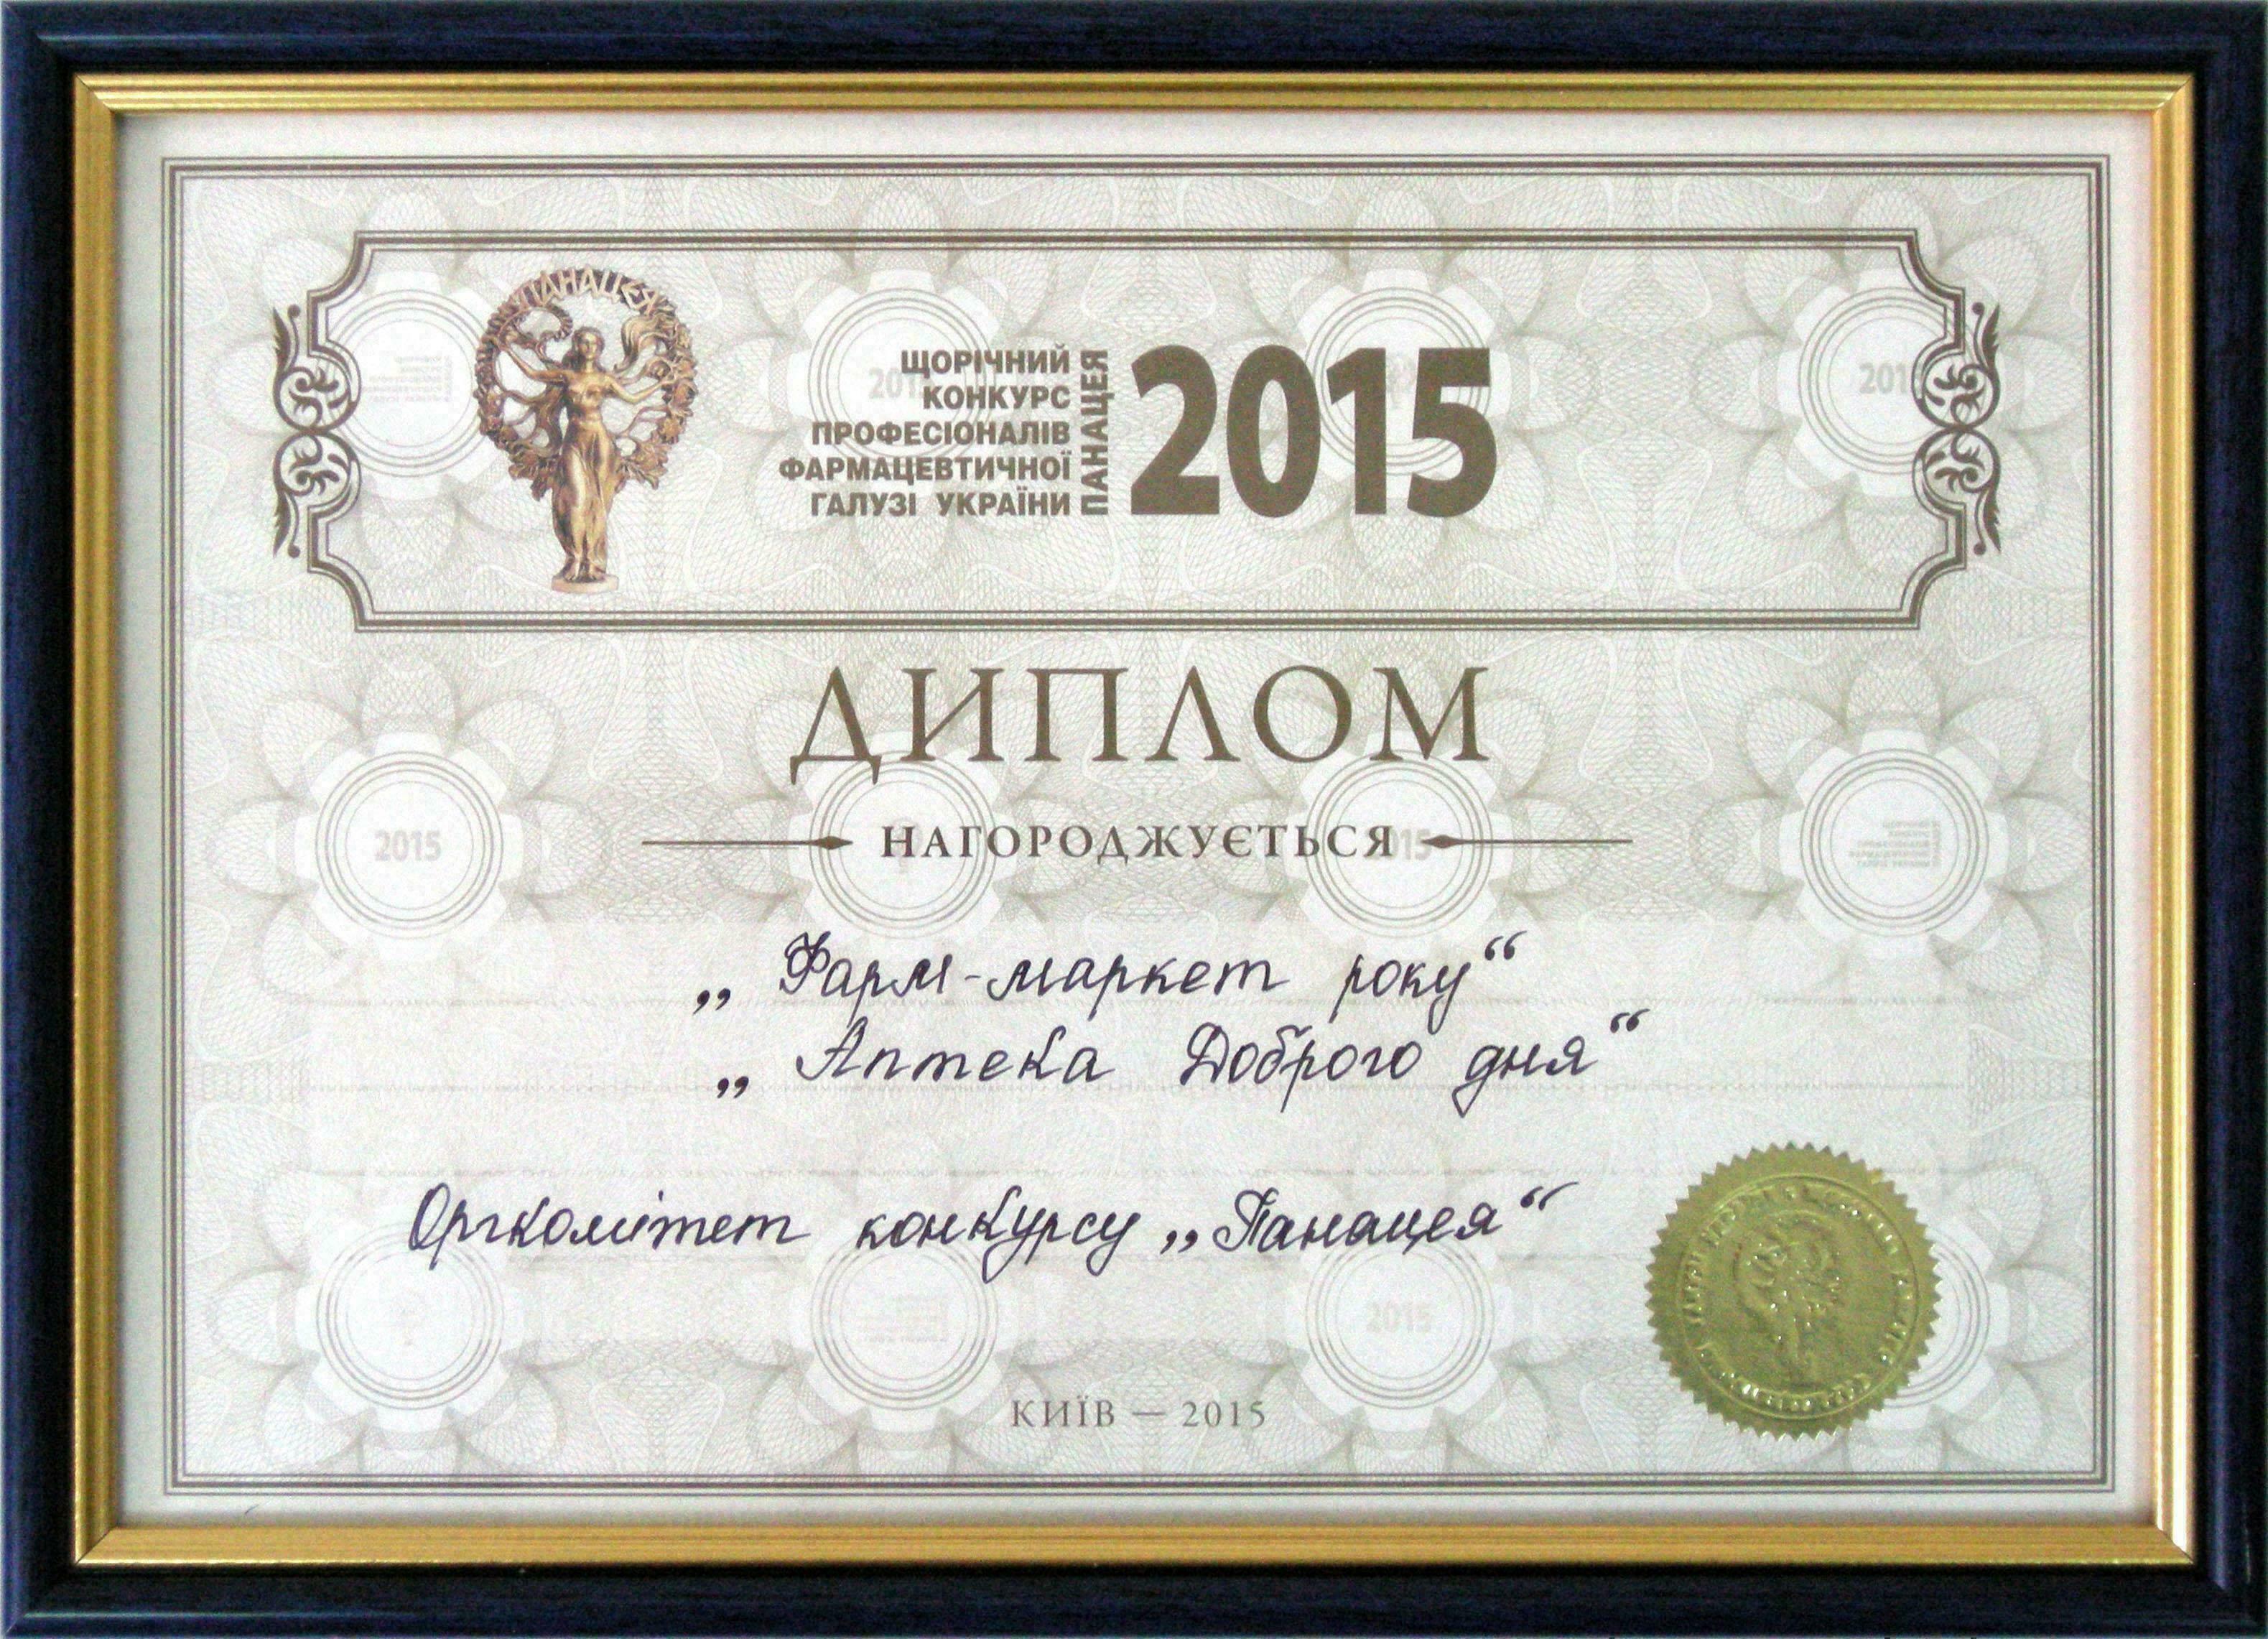 Diplom_panatseya